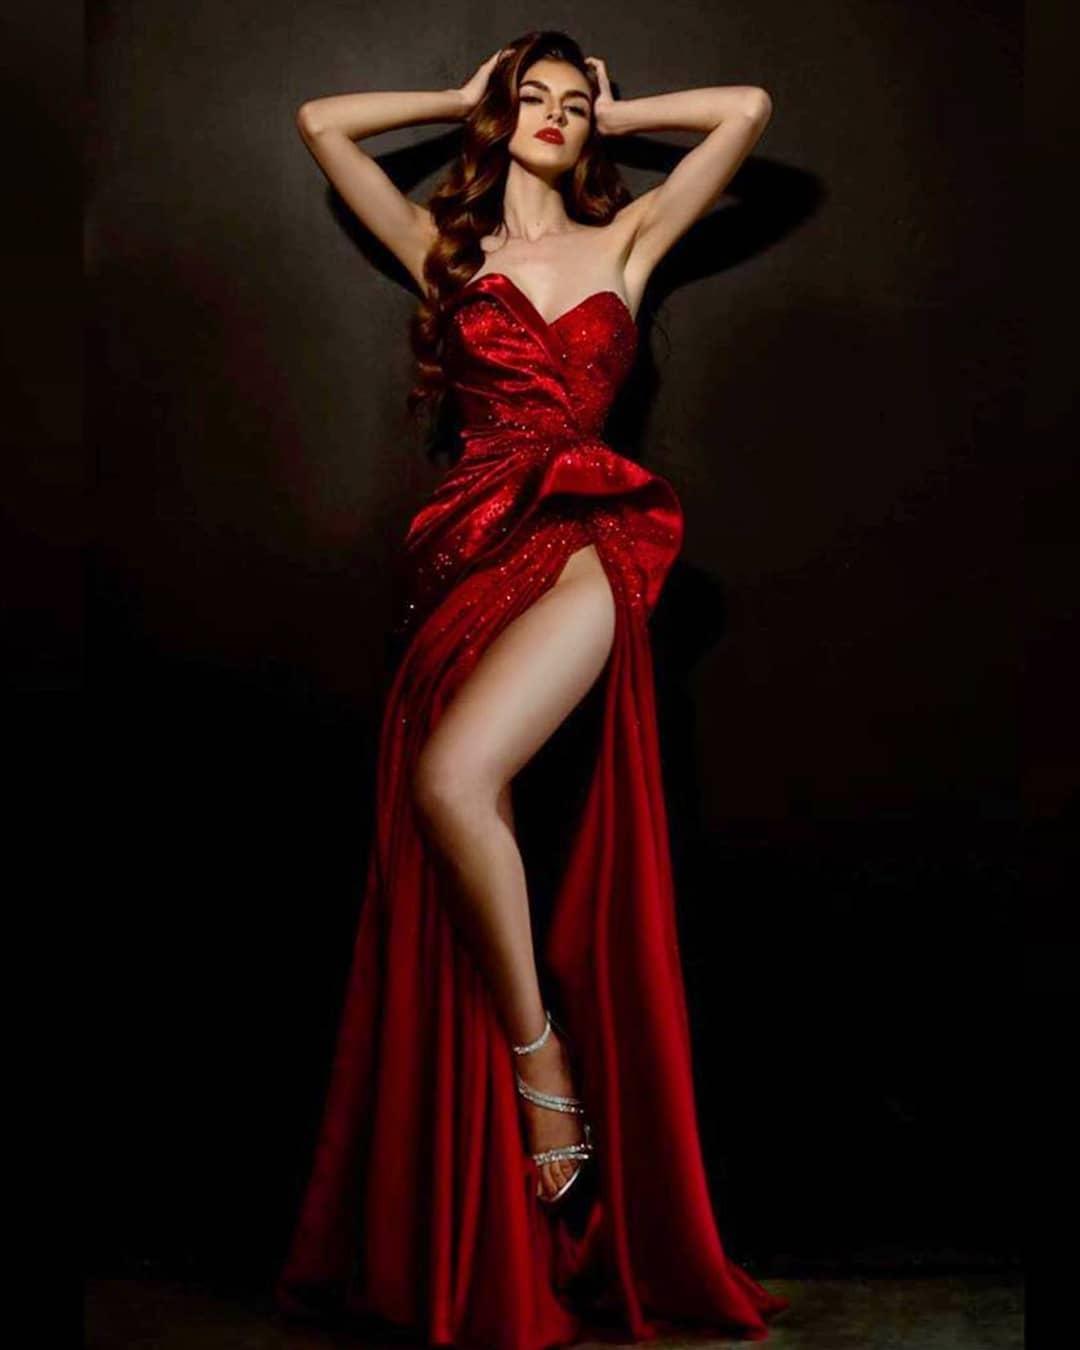 elizabeth de alba, miss grand aguascalientes 2020/top 15 de top model of the world 2019. - Página 5 78866610